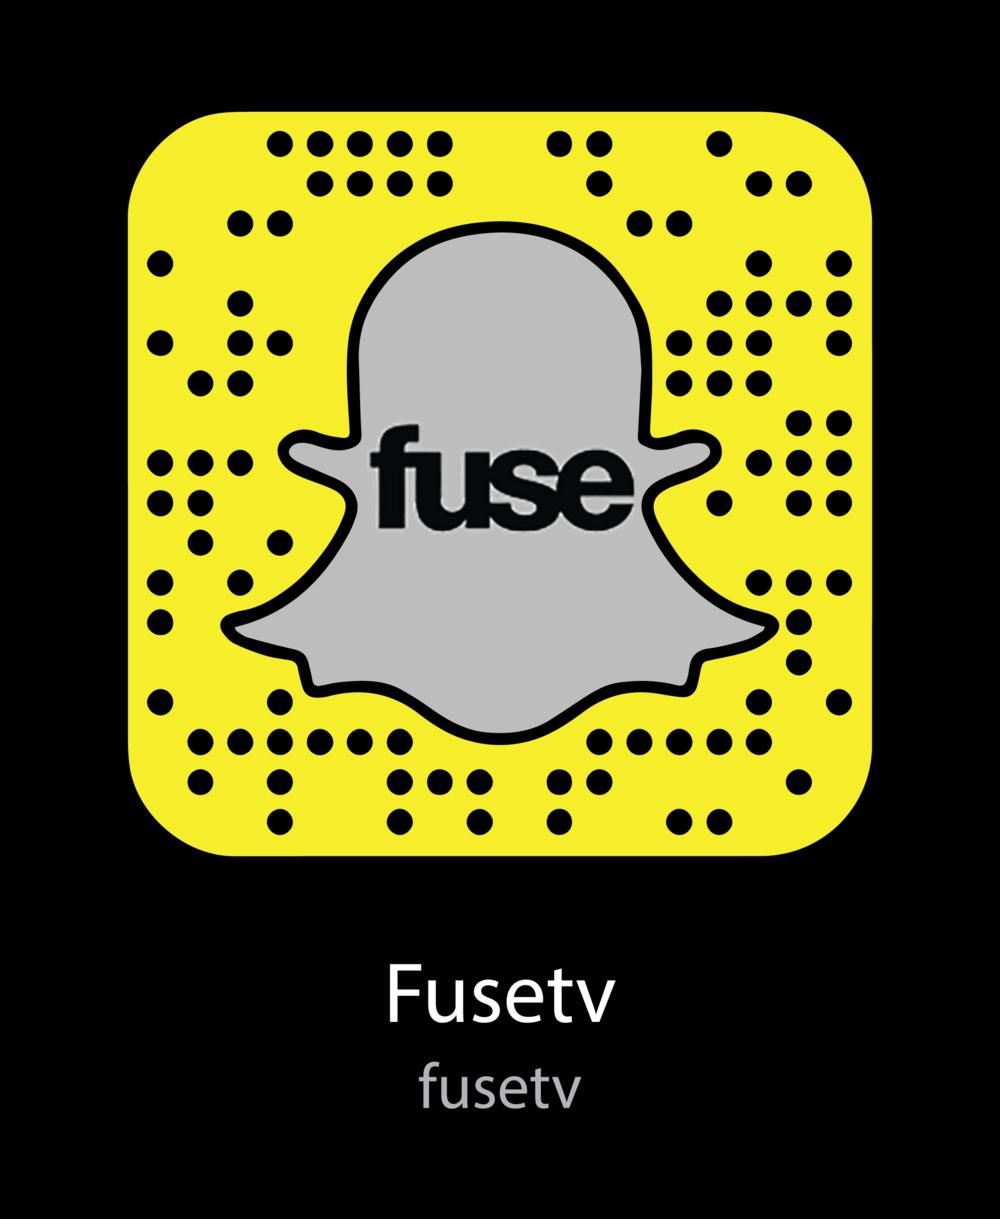 fusetv-Brands-snapchat-snapcode.png